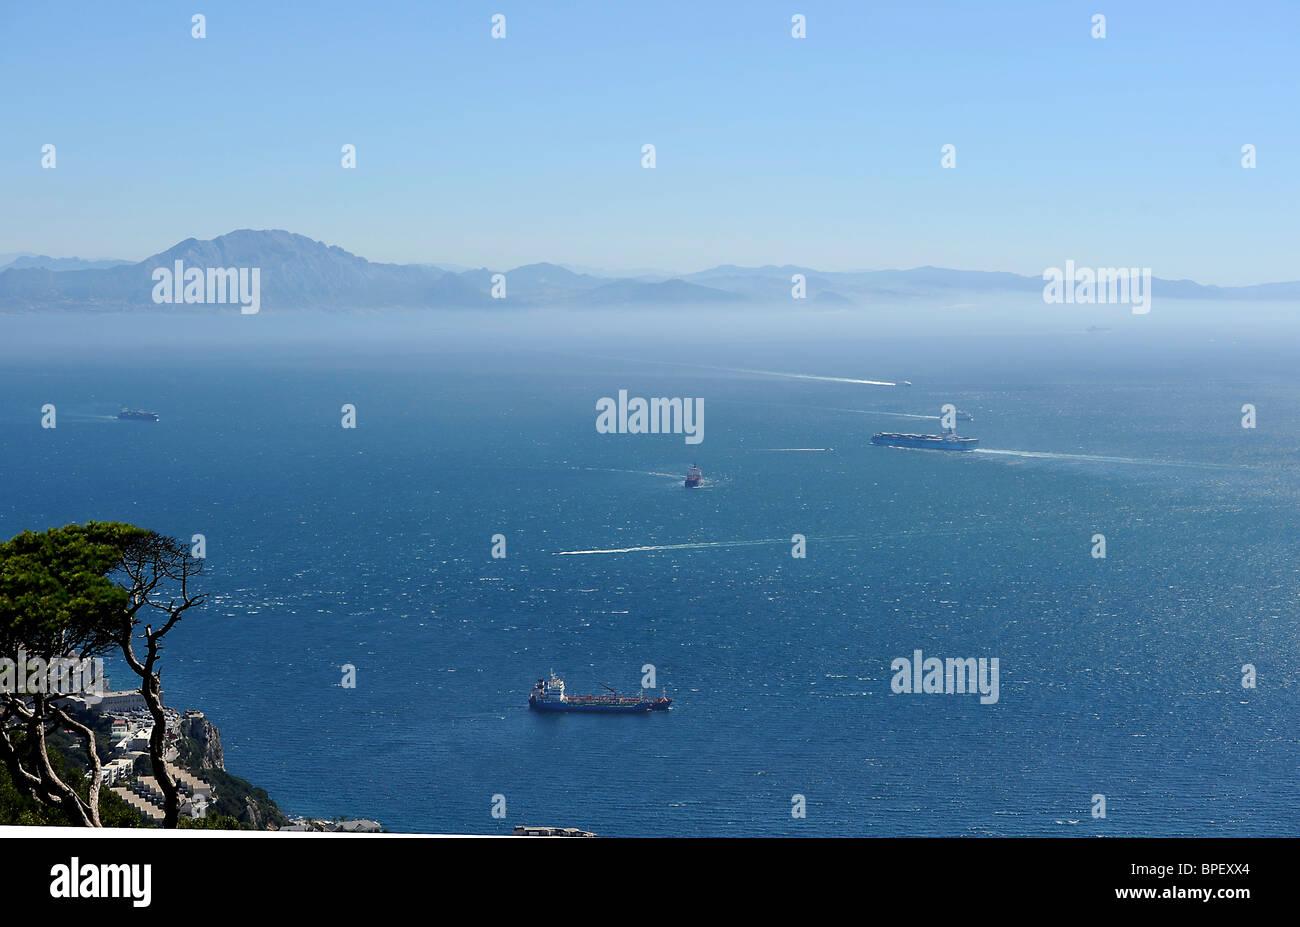 Marocco, Marokko, Afrika, Africa, Gibraltar, Meer Europa Europe  Straße von Gibraltar Strait of Gibraltar - Stock Image